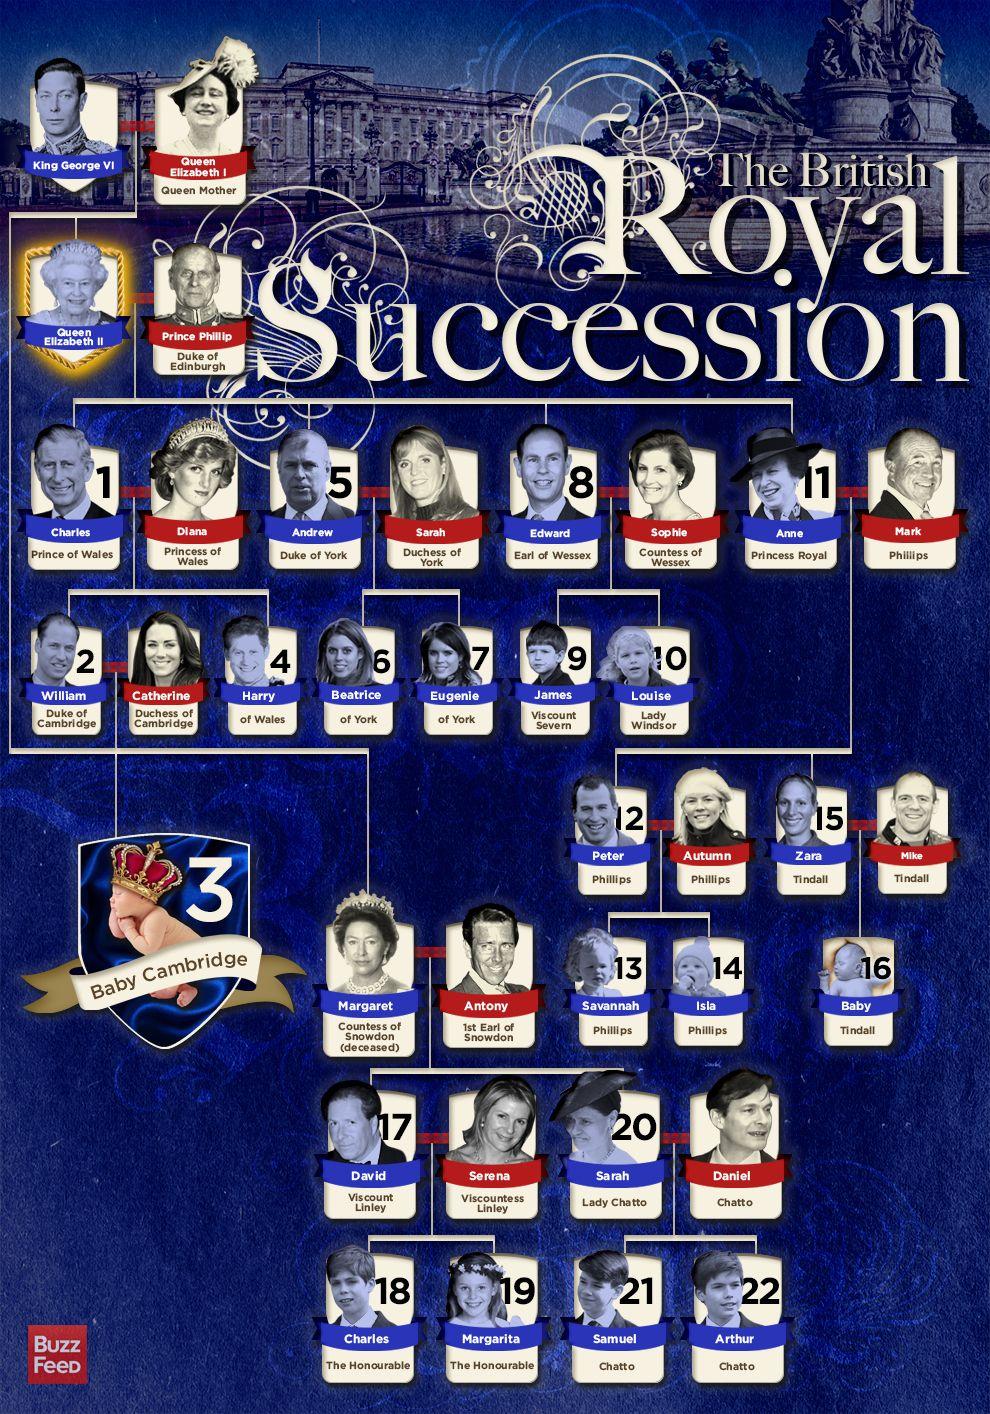 The British Royal Succession